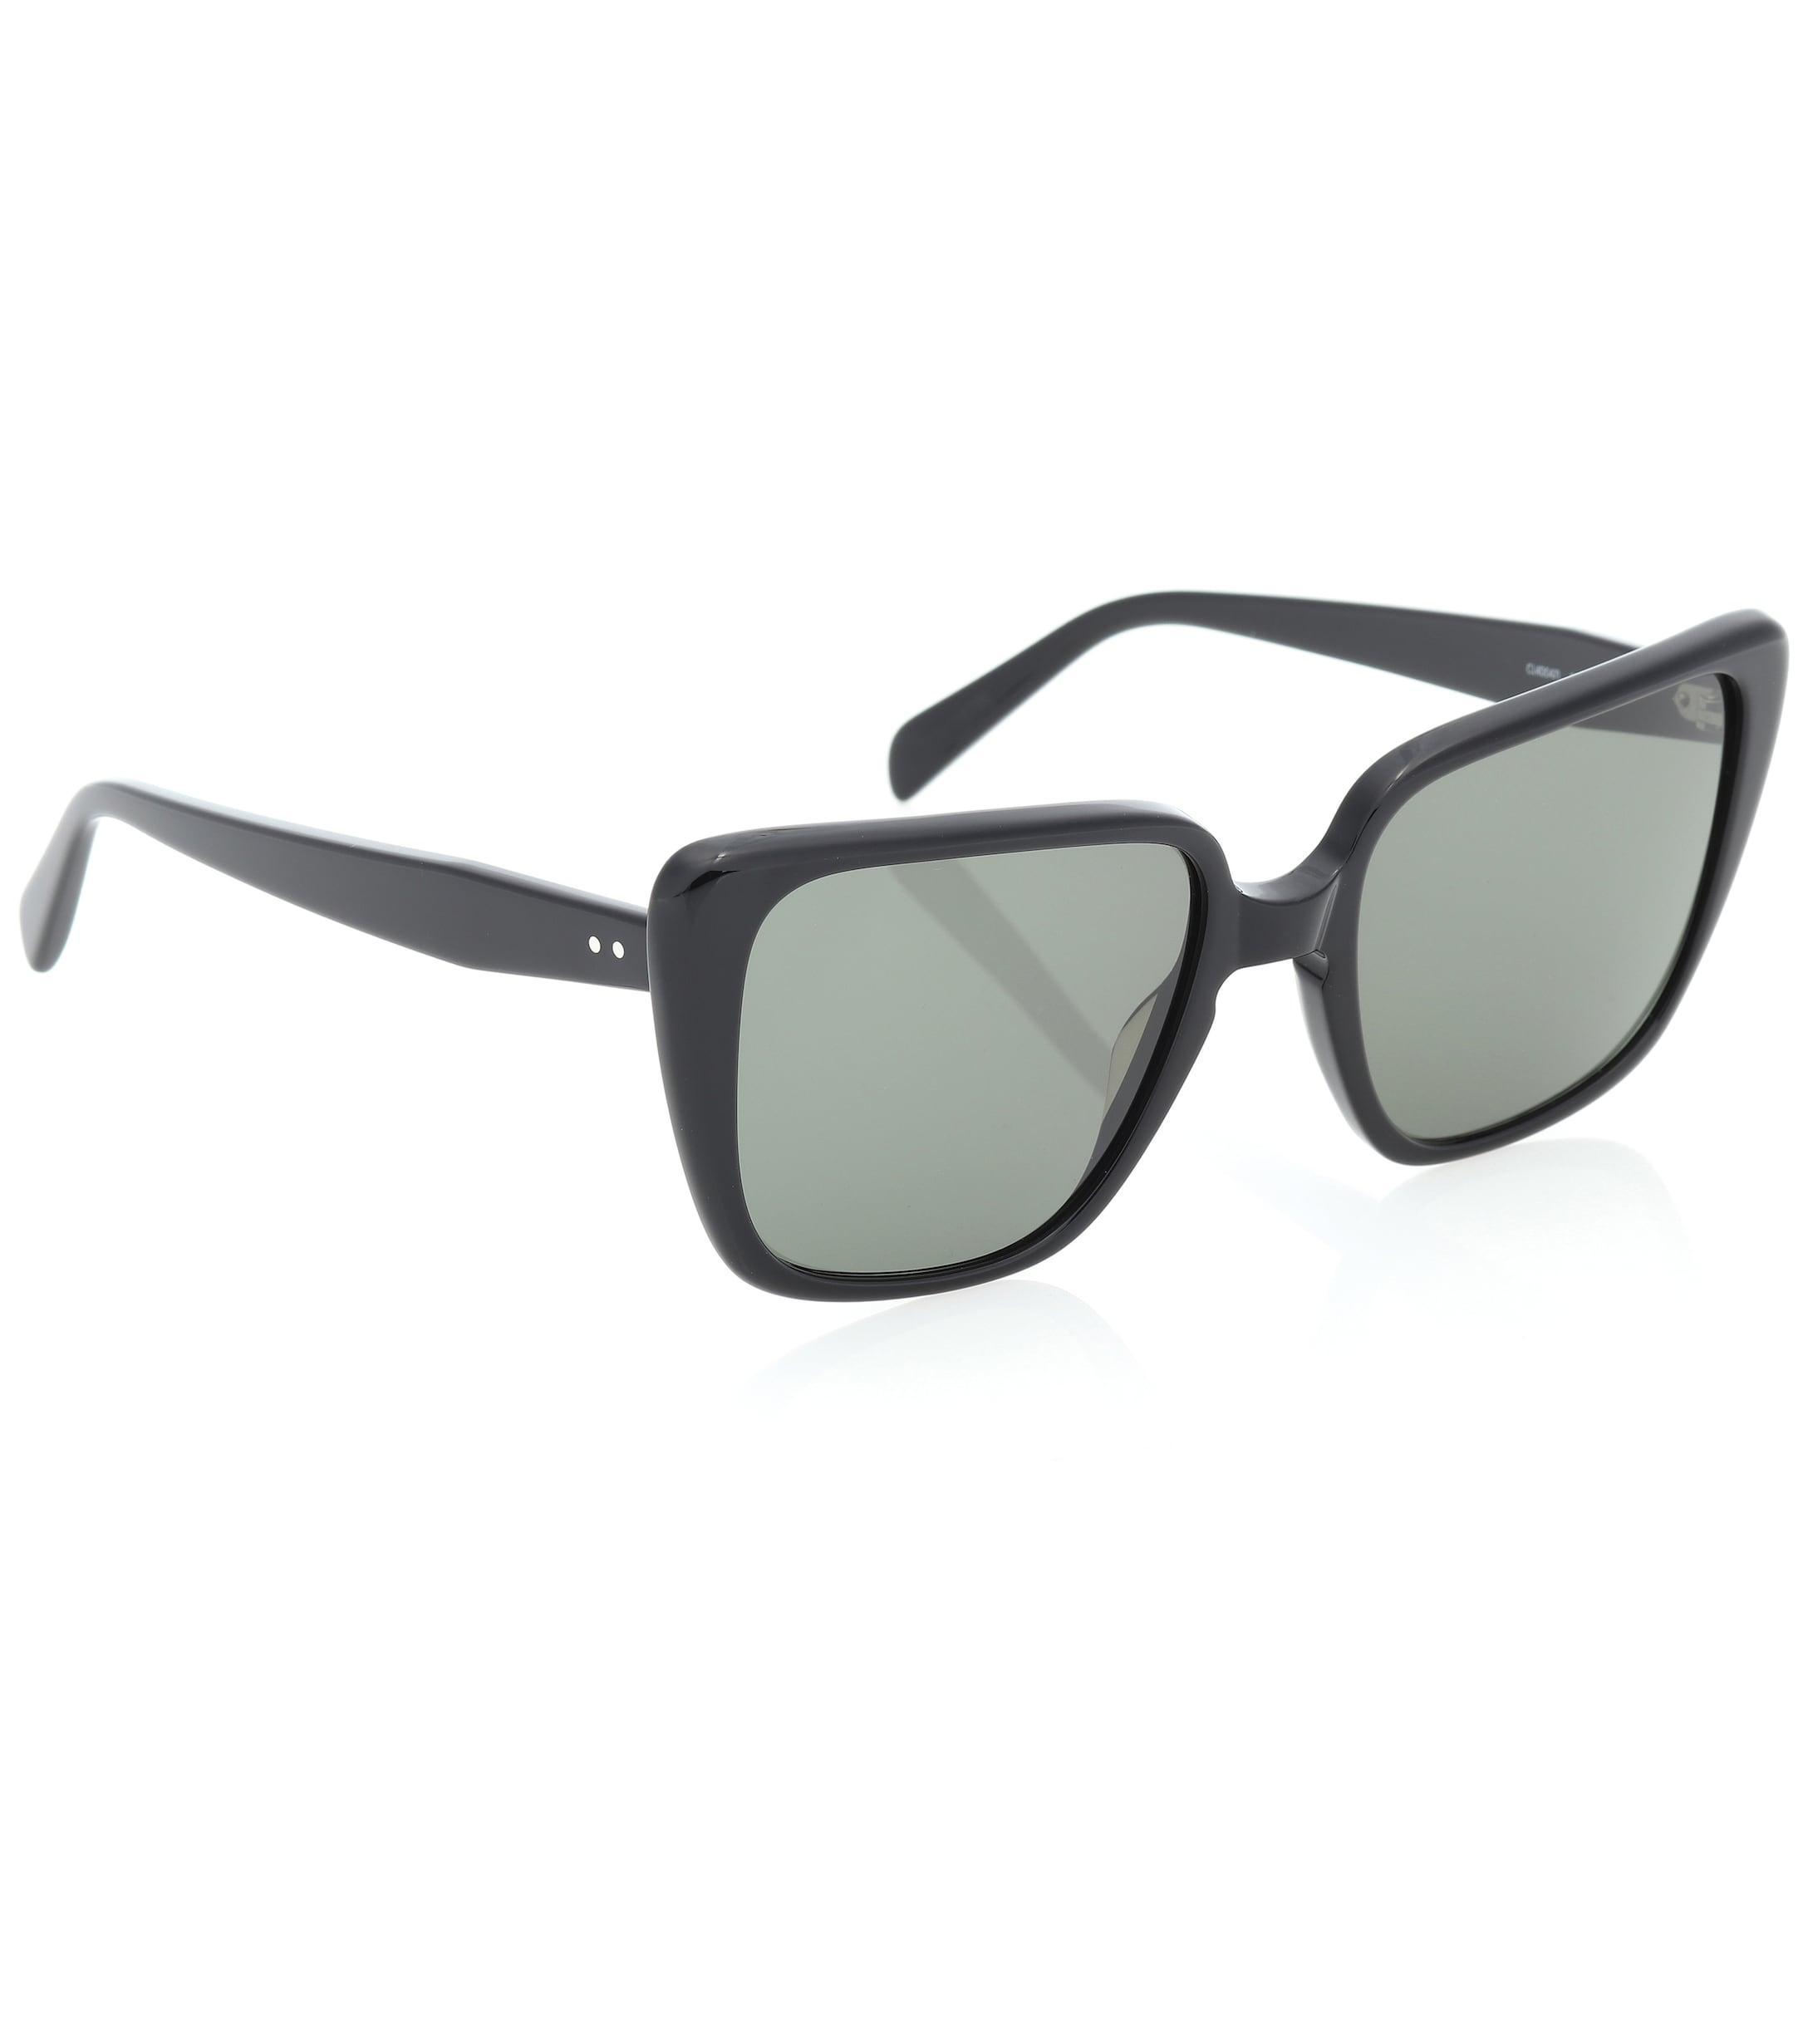 46f260712e0 Butterfly Lyst Rectangular In Céline Sunglasses Black qf4fp7w